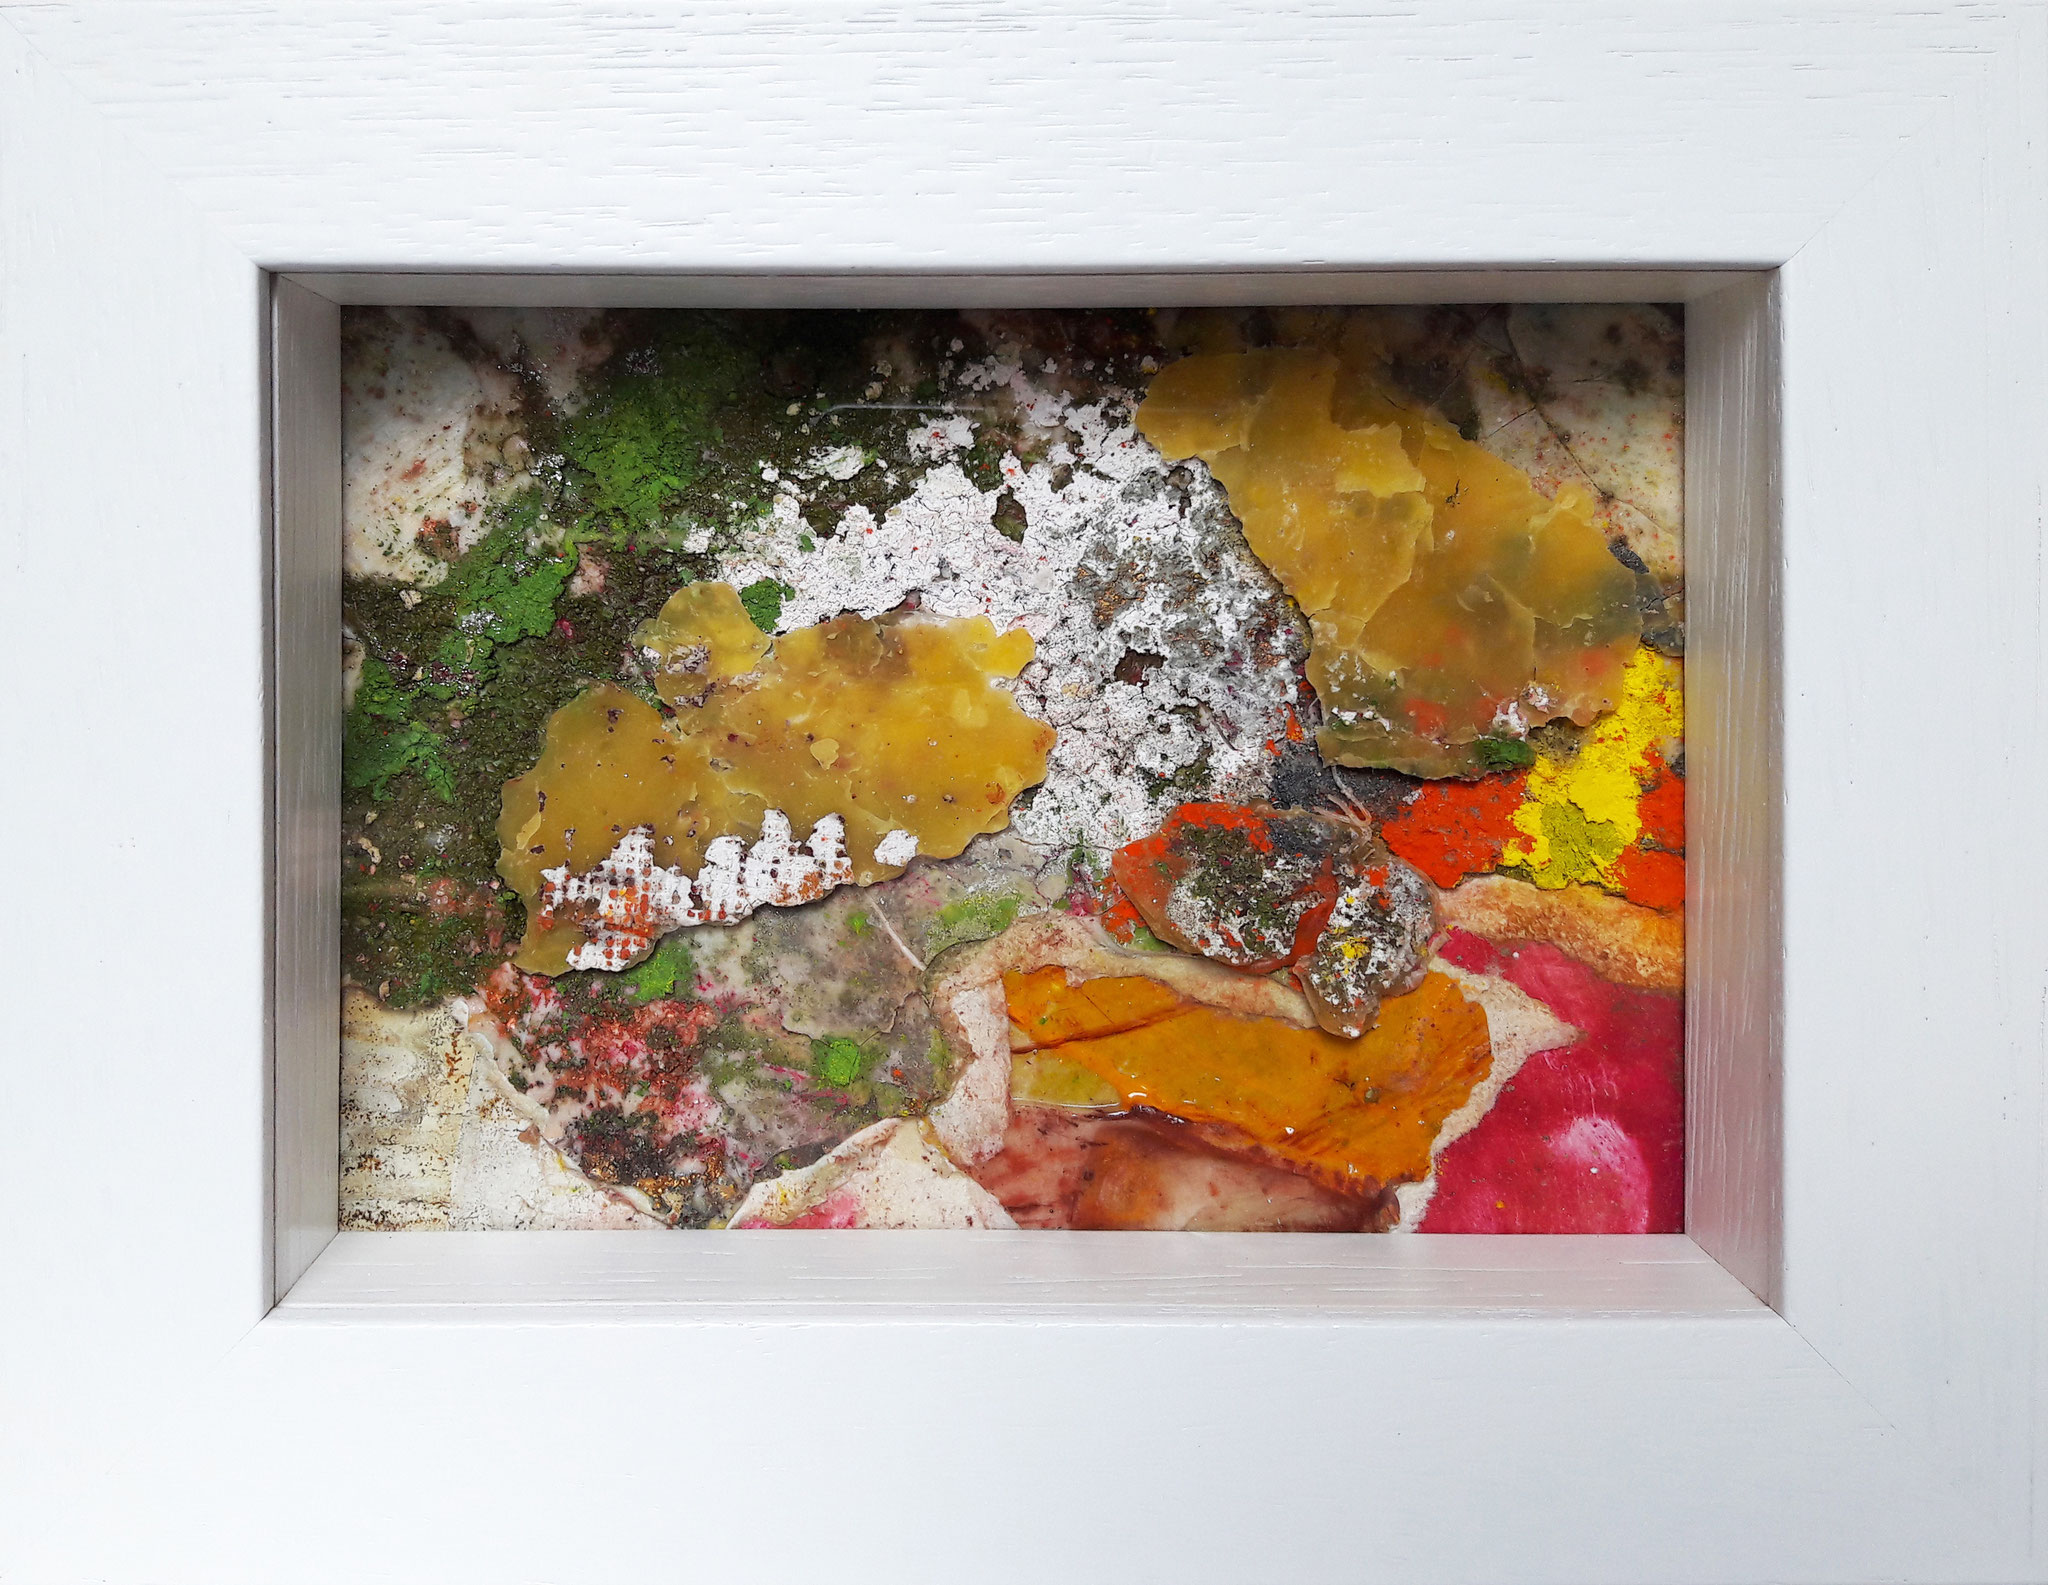 Papperlapapp 5, Acrylmischtechnik, 23 x 18 mit Rahmen, 2017, 140 Euro